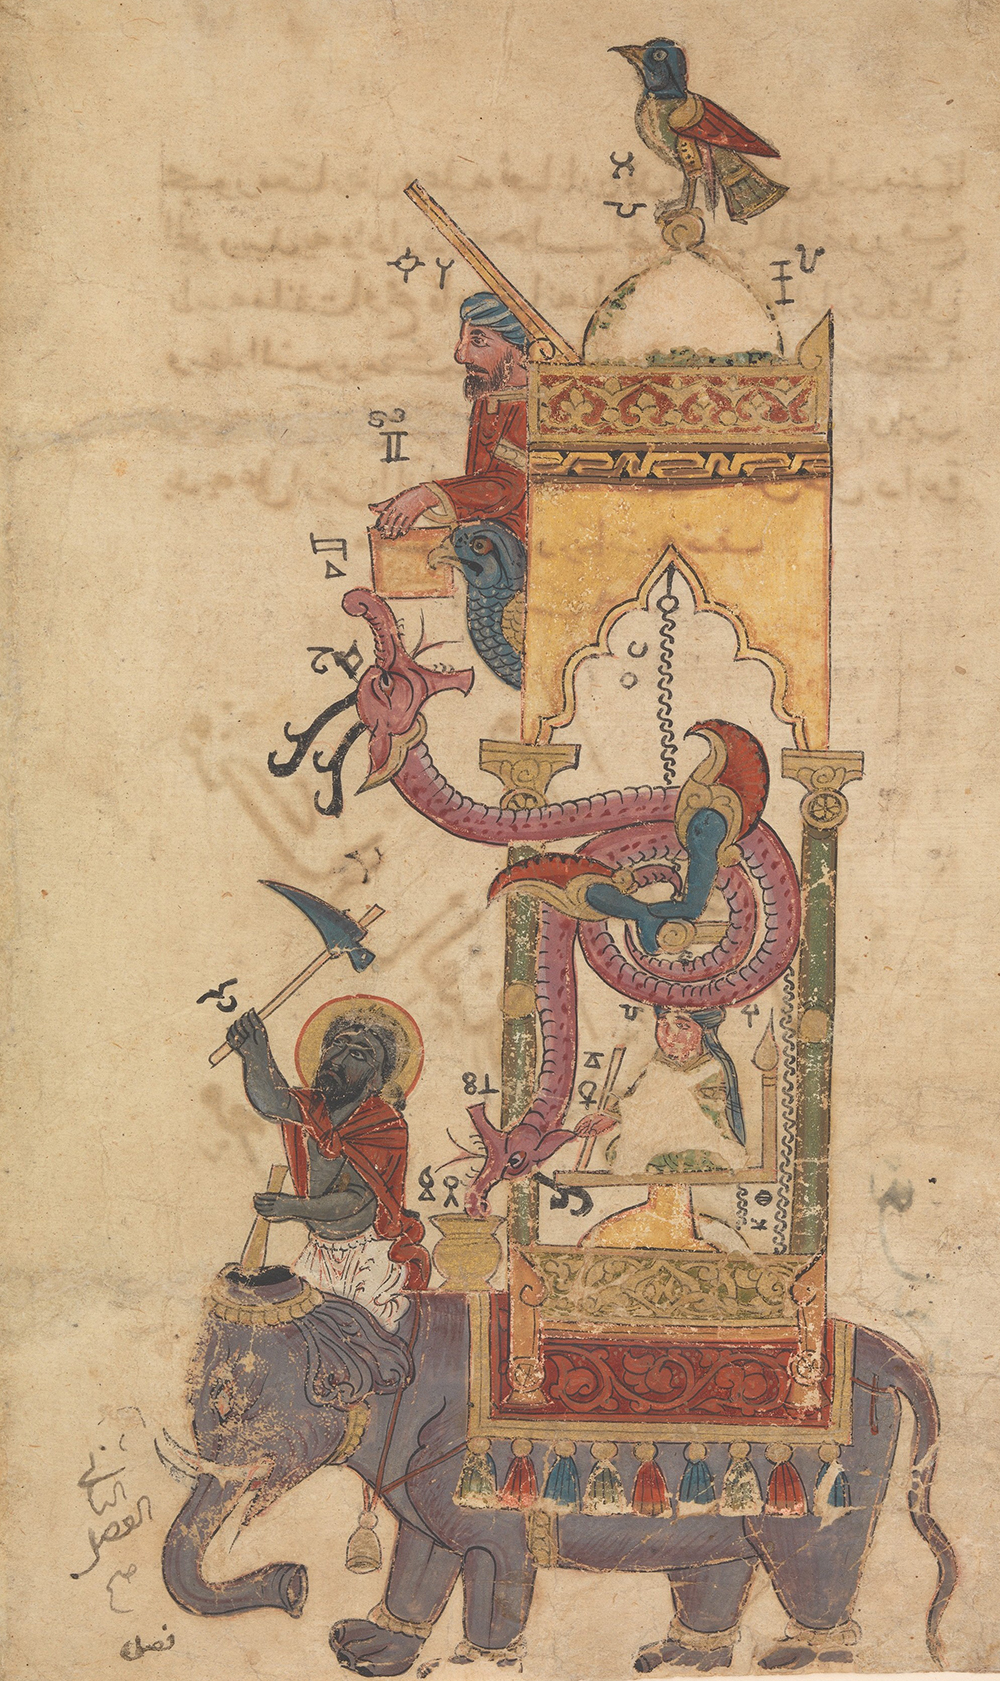 """The Elephant Clock,"" folio from Book of the Knowledge of Ingenious Mechanical Device, illustration by al-Jazariby Farrukh ibn ʿAbd al-Latif."